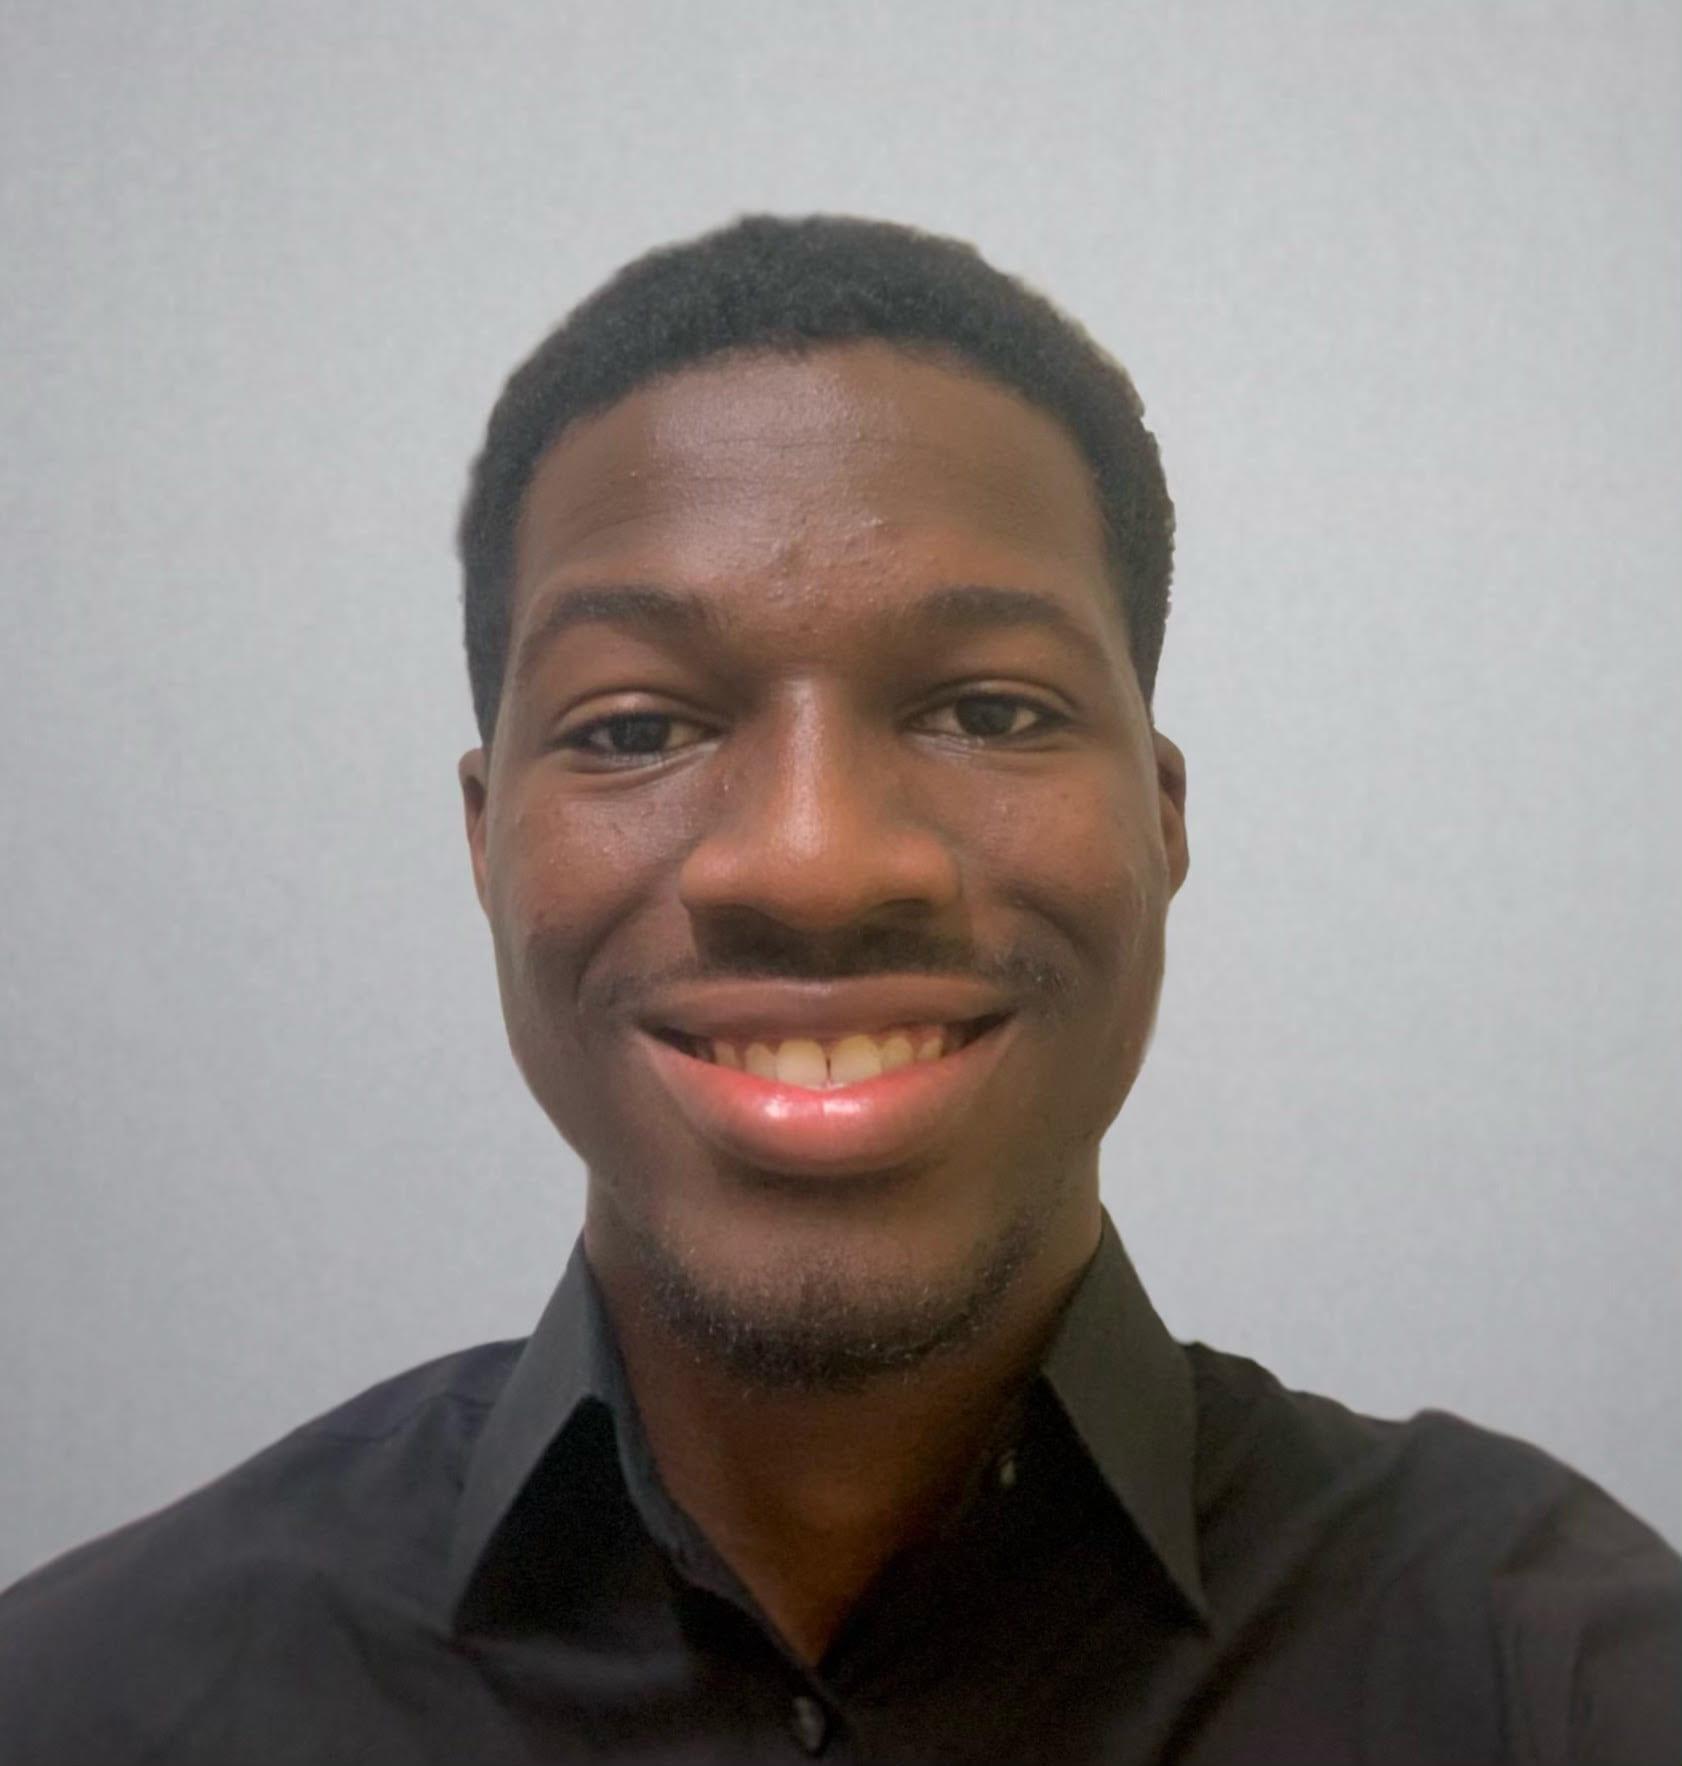 Chimaobi Amanchukwu